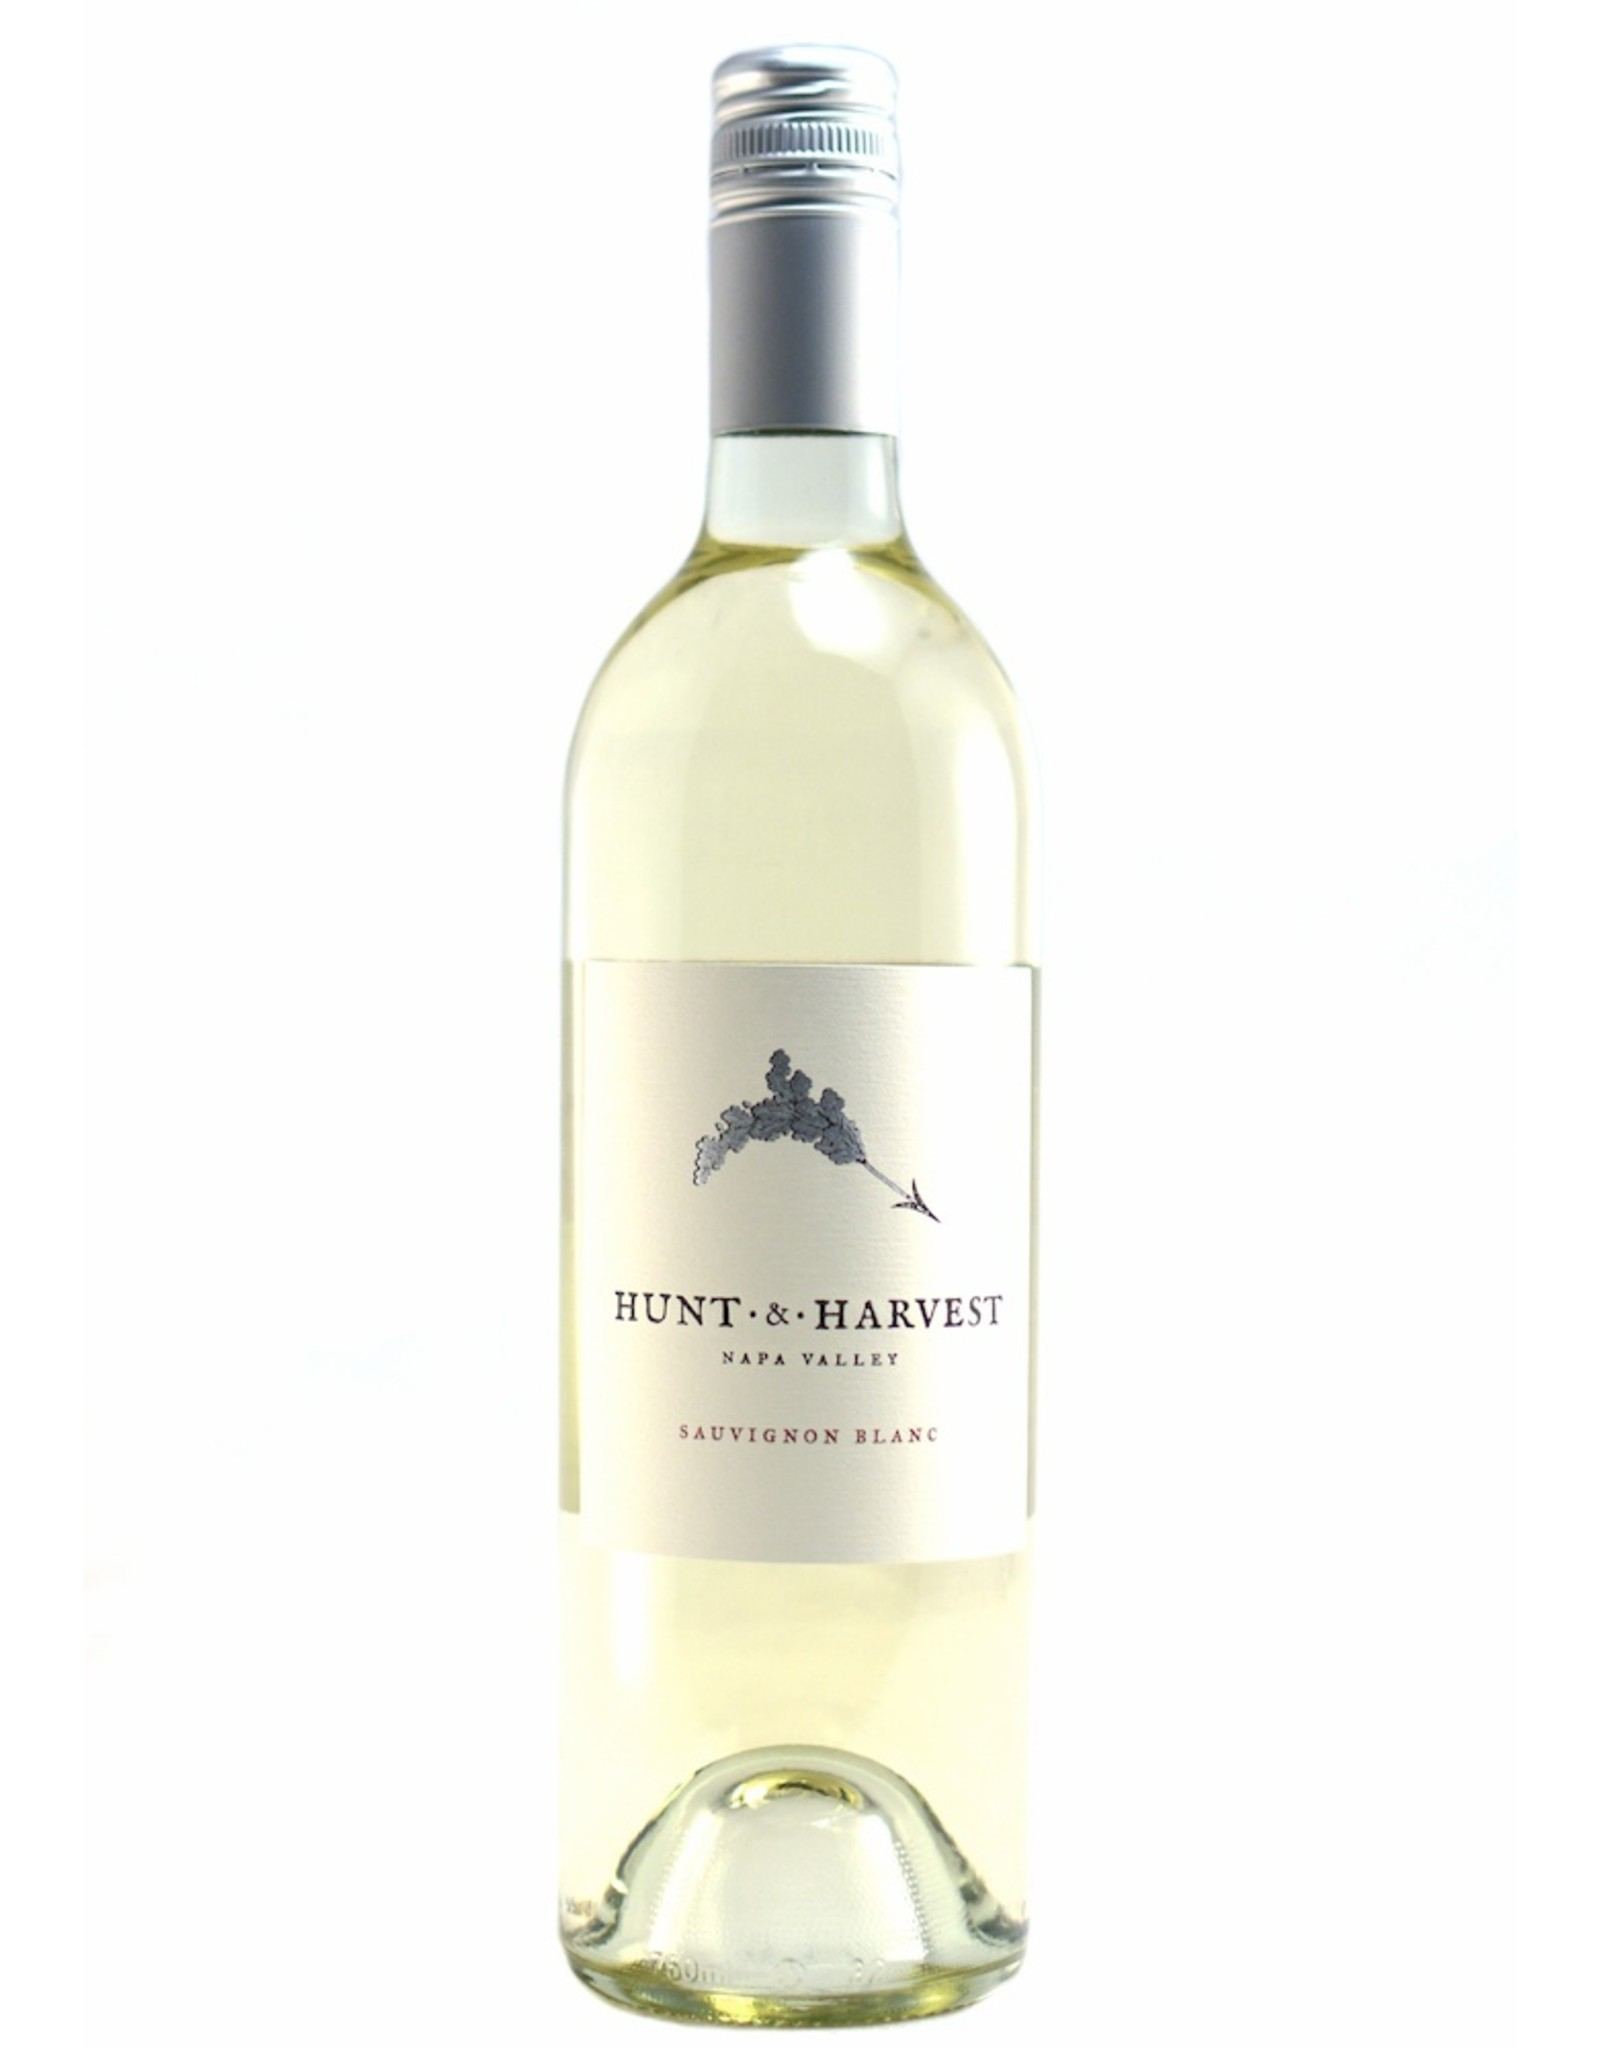 Hunt & Harvest Sauvignon Blanc